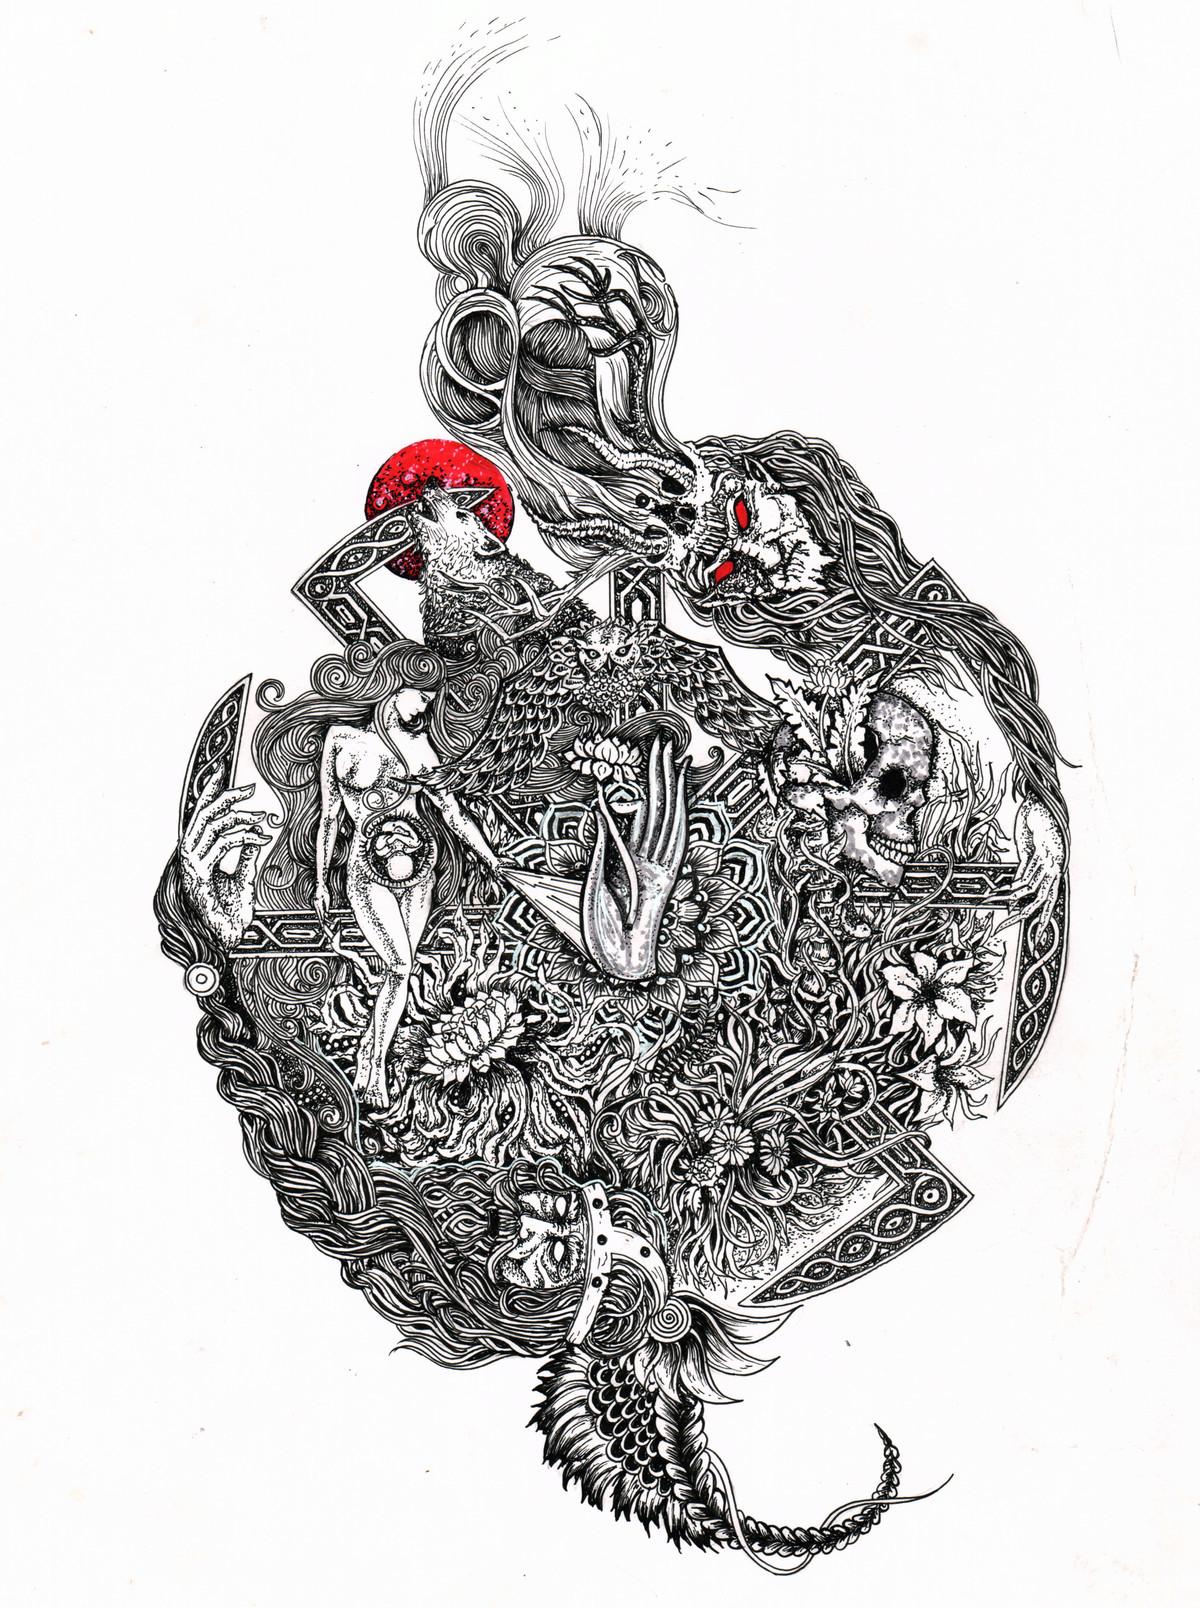 Table of Antithesis by Pallab Baruah, Illustration Digital Art, Digital Print on Paper, Gray color